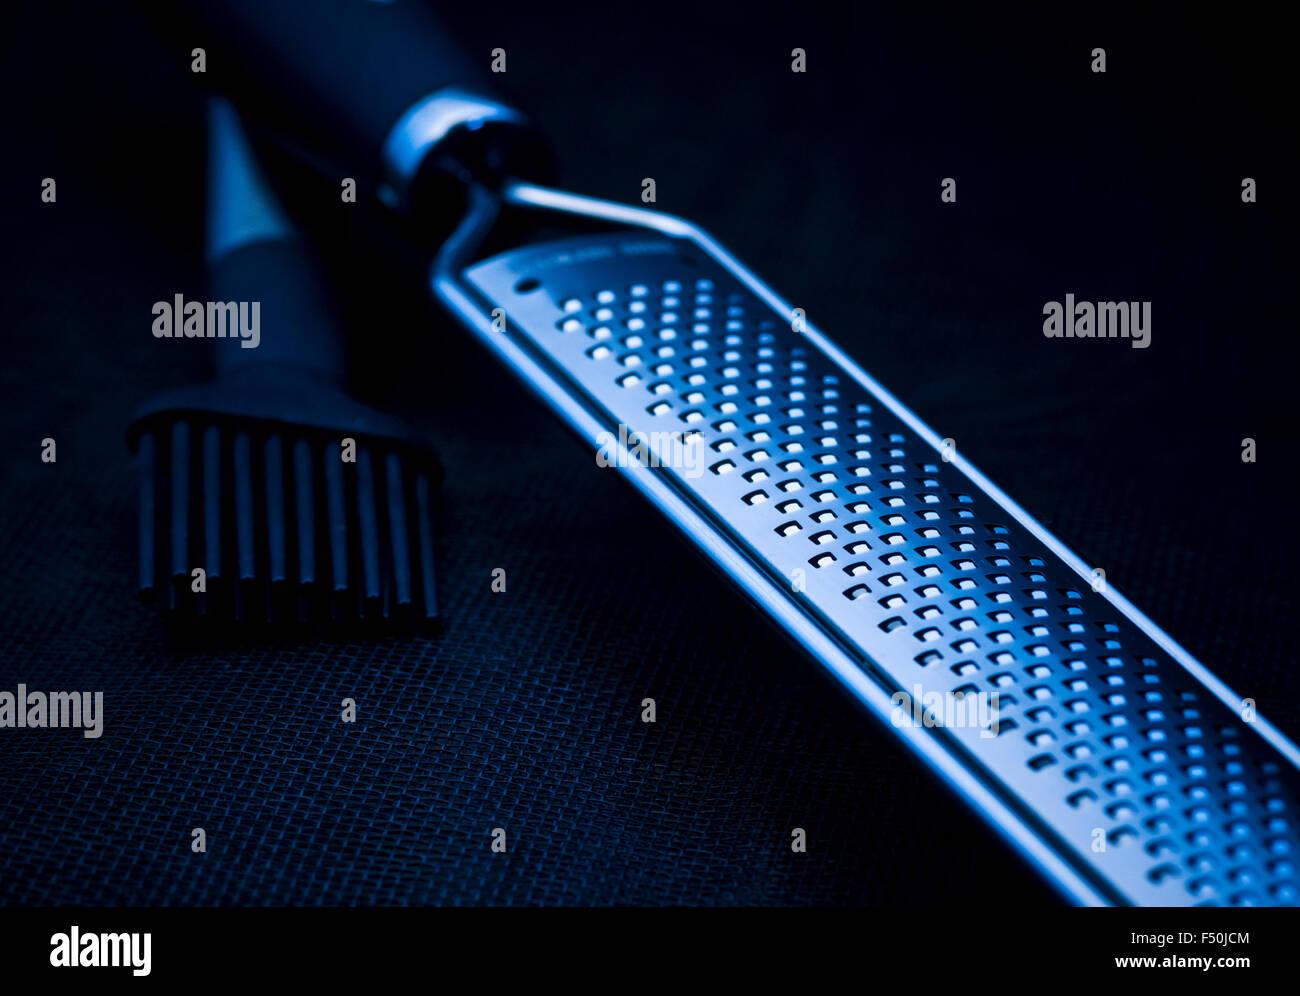 kitchen supplies;grater;brush;product shot;black mash;steel grater;blue light Stock Photo